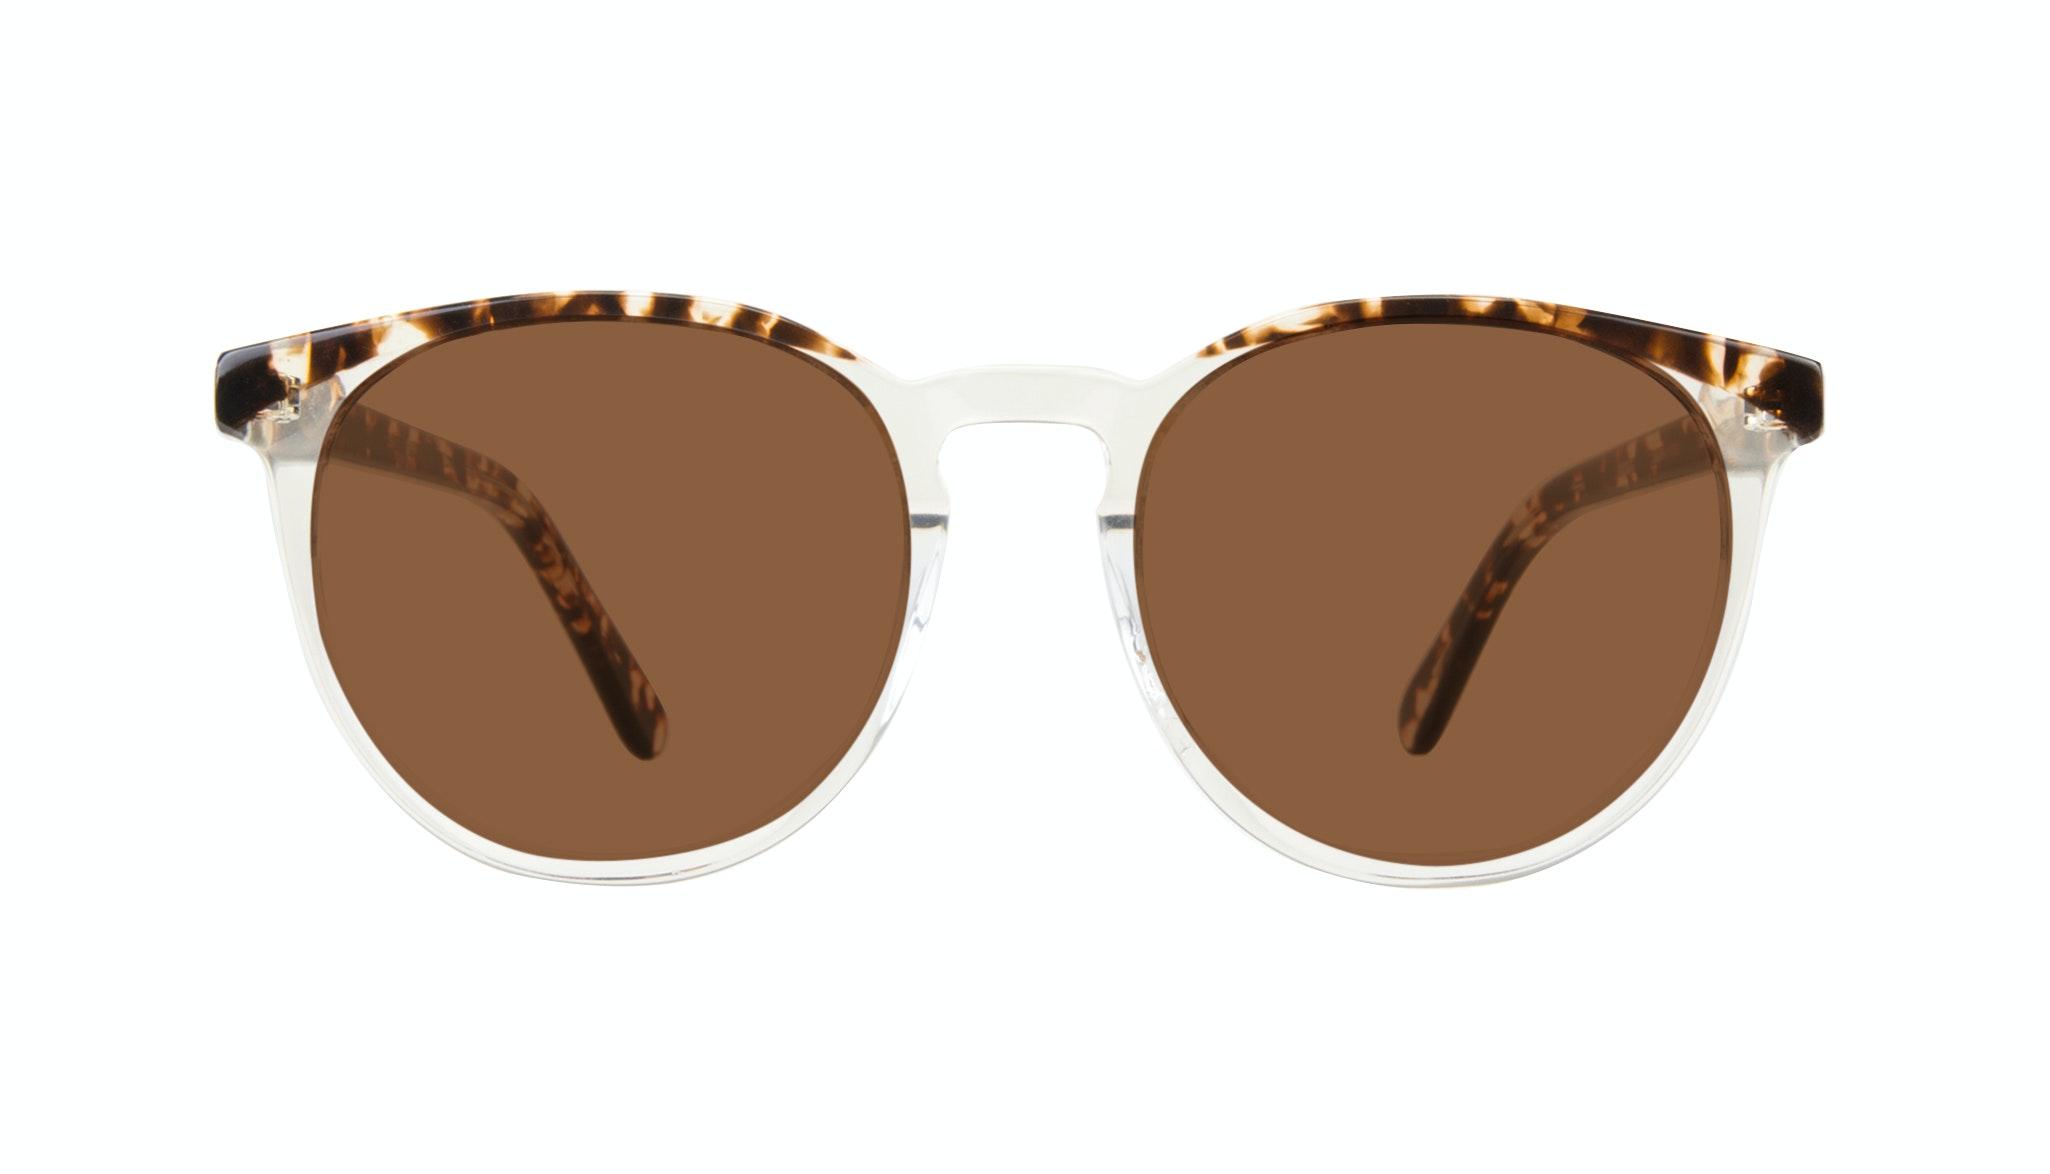 Affordable Fashion Glasses Round Eyeglasses Women Brilliant Blond Tortoise